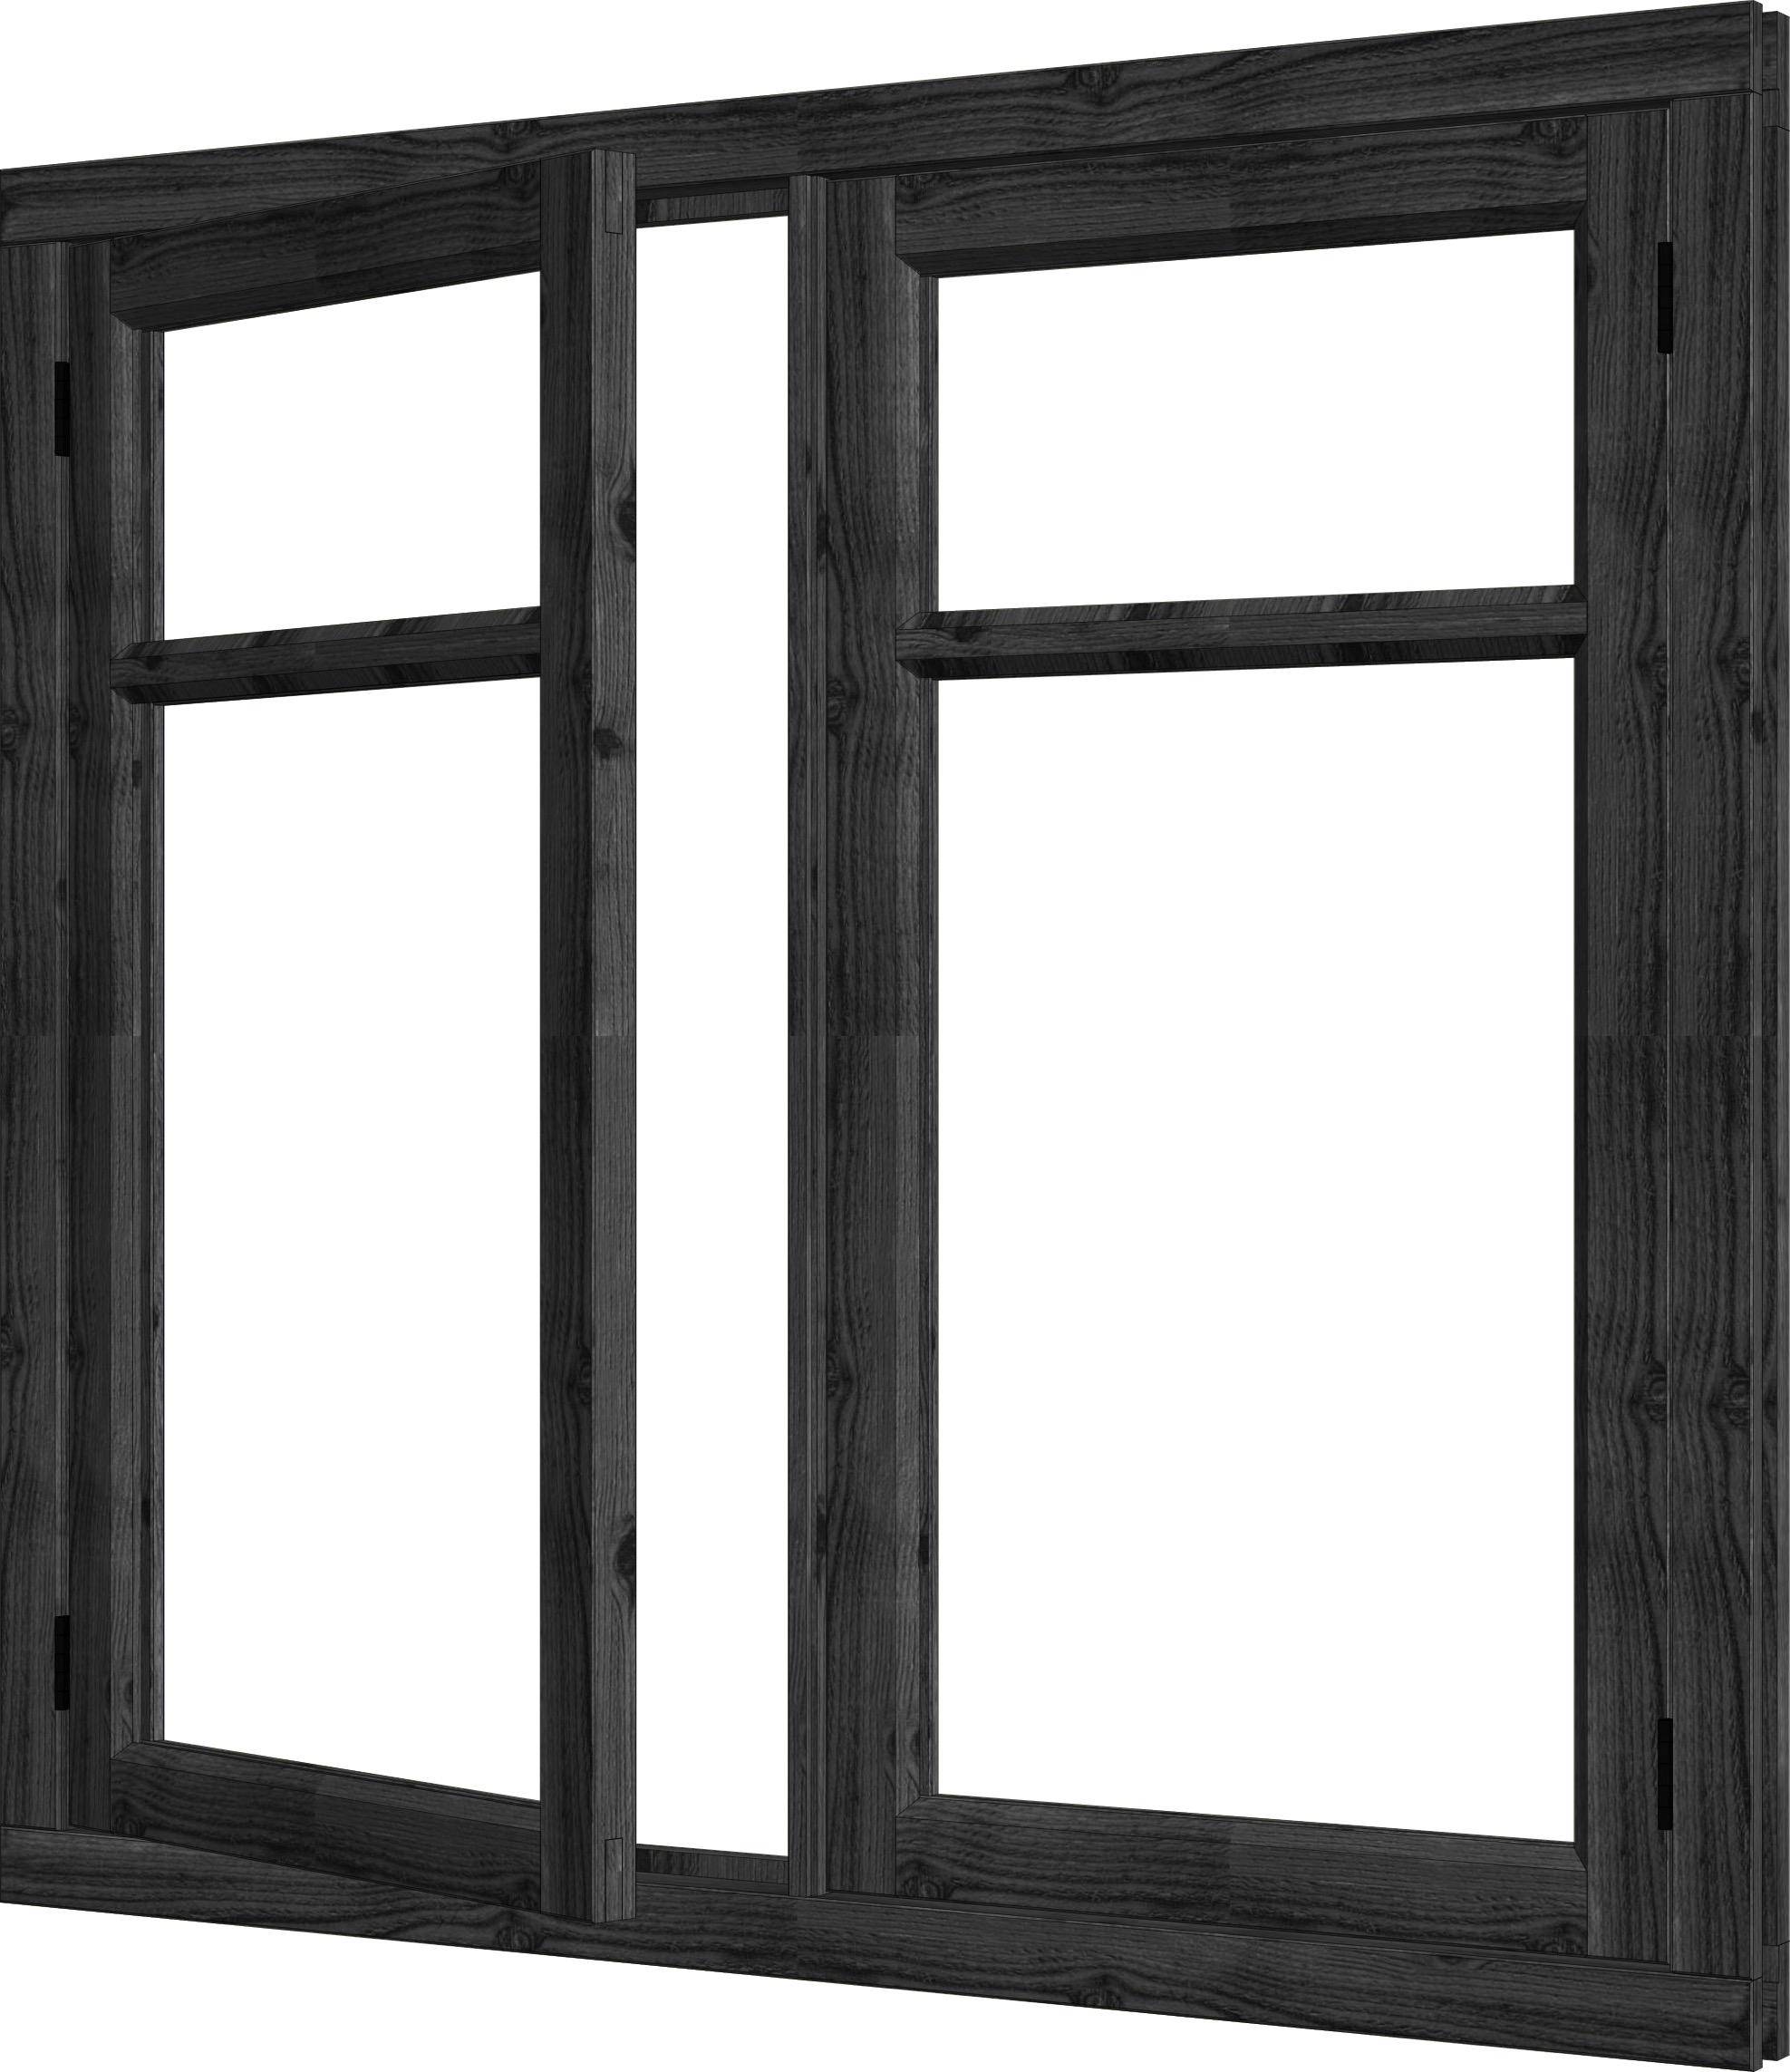 Trendhout | Steel Look Vleugelraam Dubbel | U2 | 151,5 x 143 cm